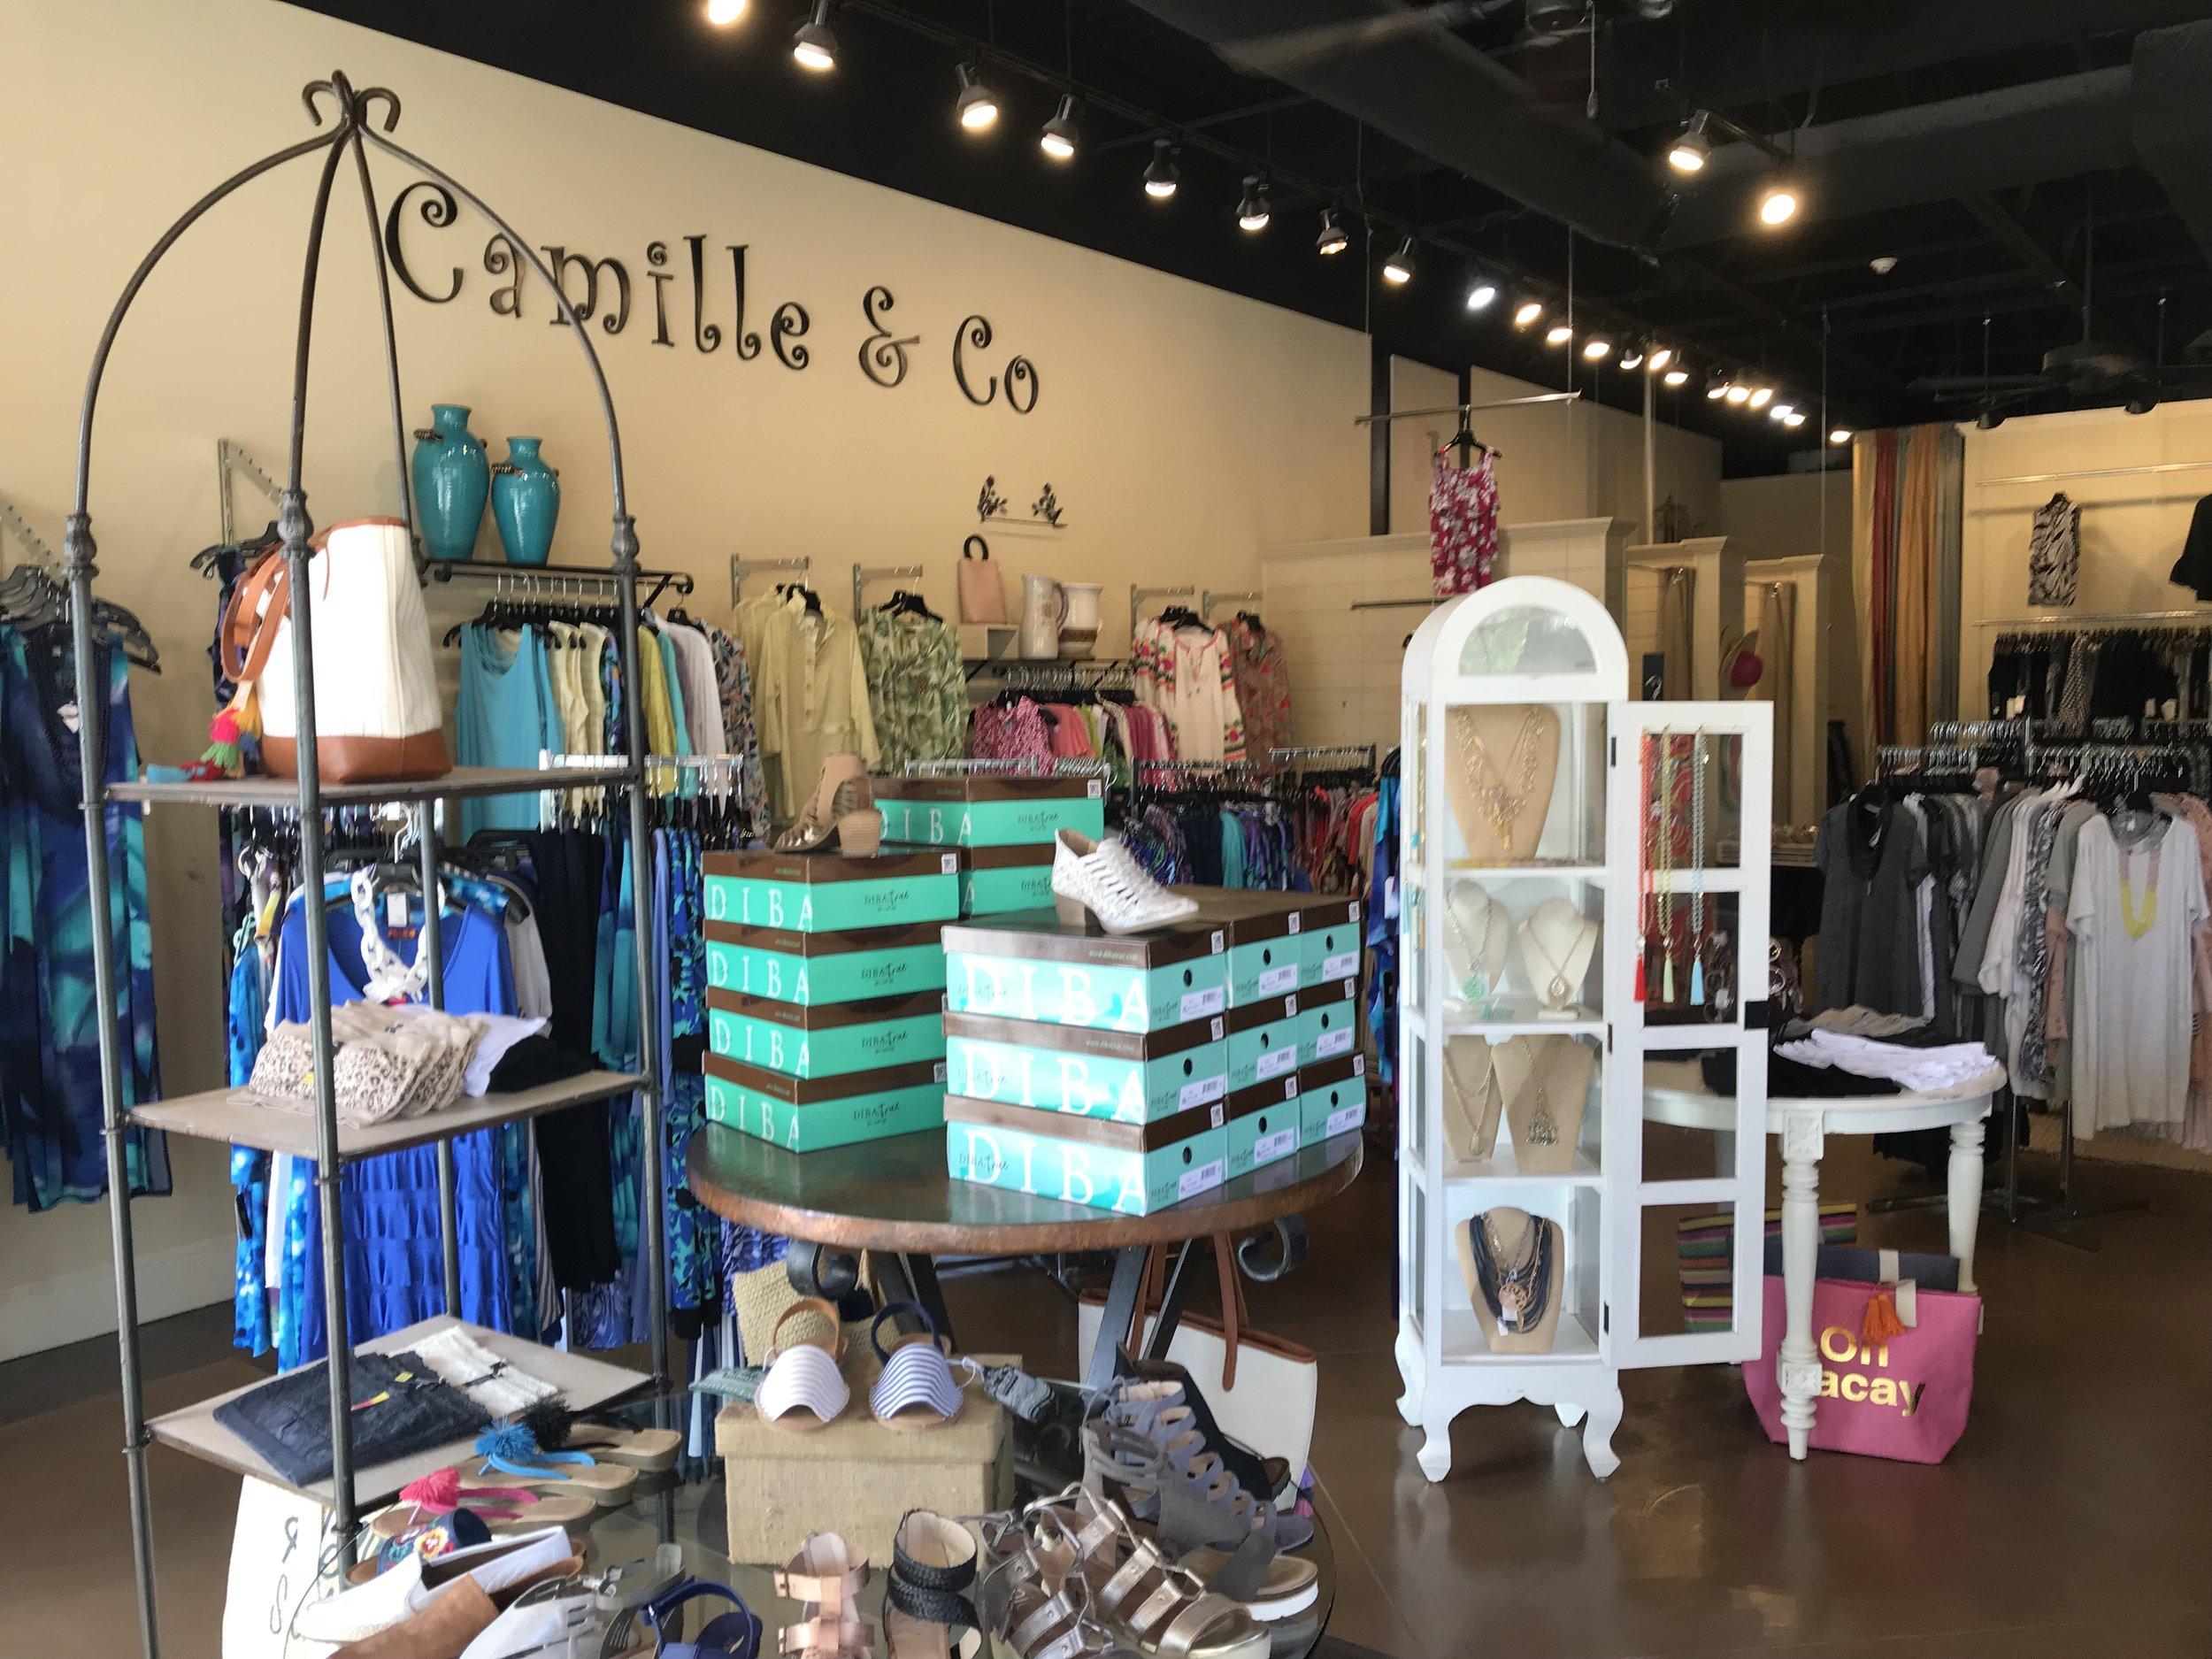 Camille & Co Lake Oconee | RealEstateLakeOconee.com